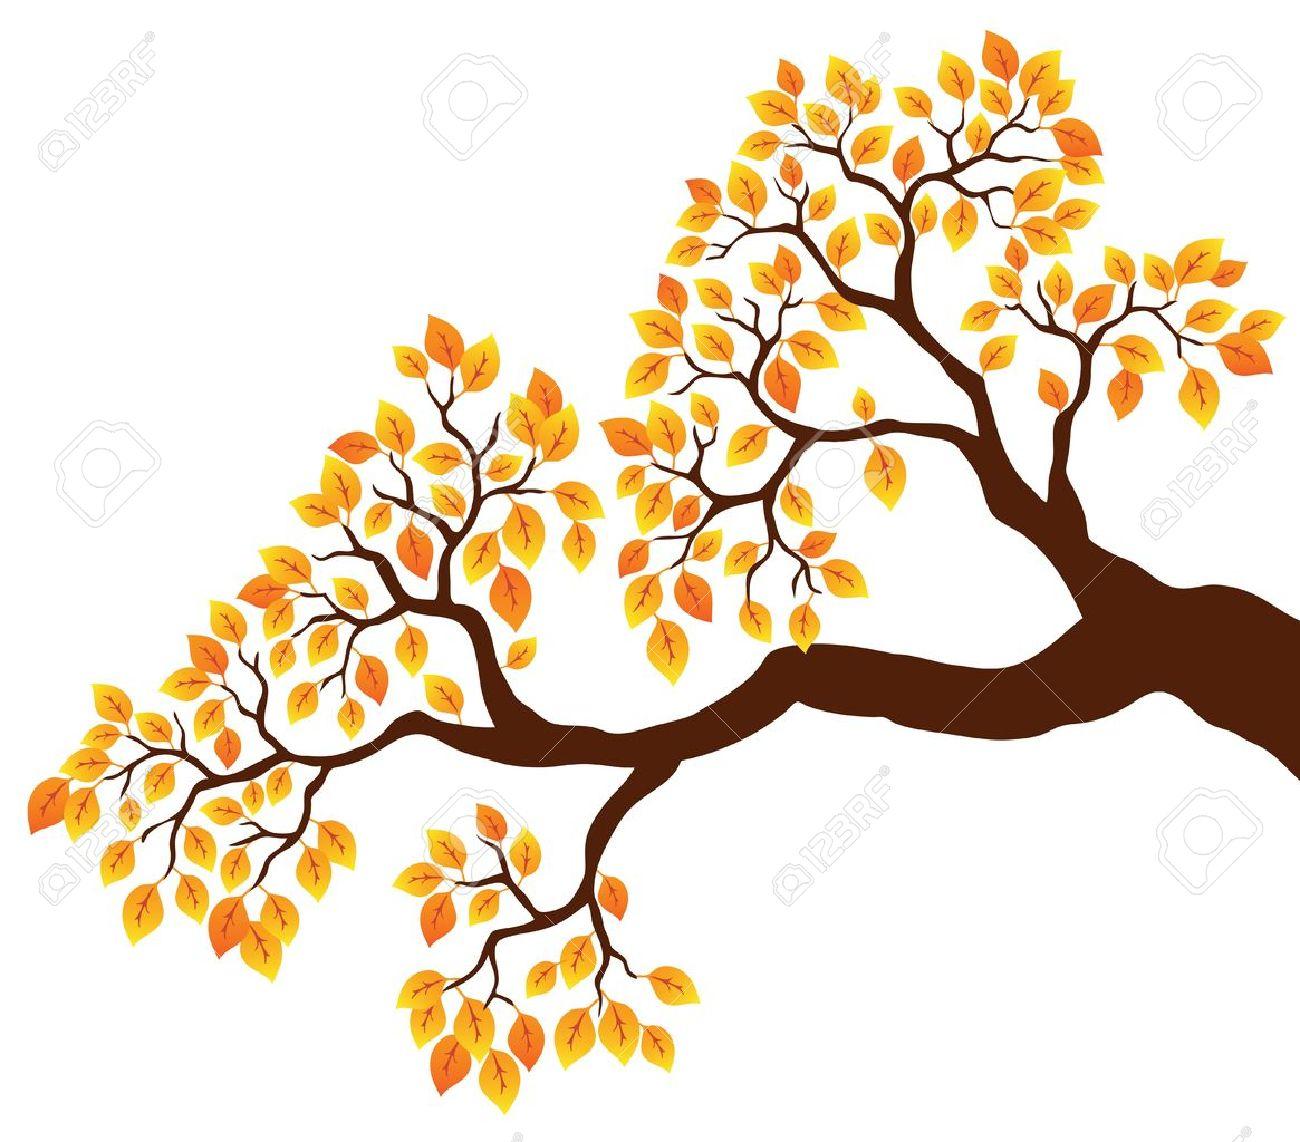 tree branch with orange leaves 1 vector illustration royalty free rh 123rf com vector christmas tree branch vector tree branch leaves